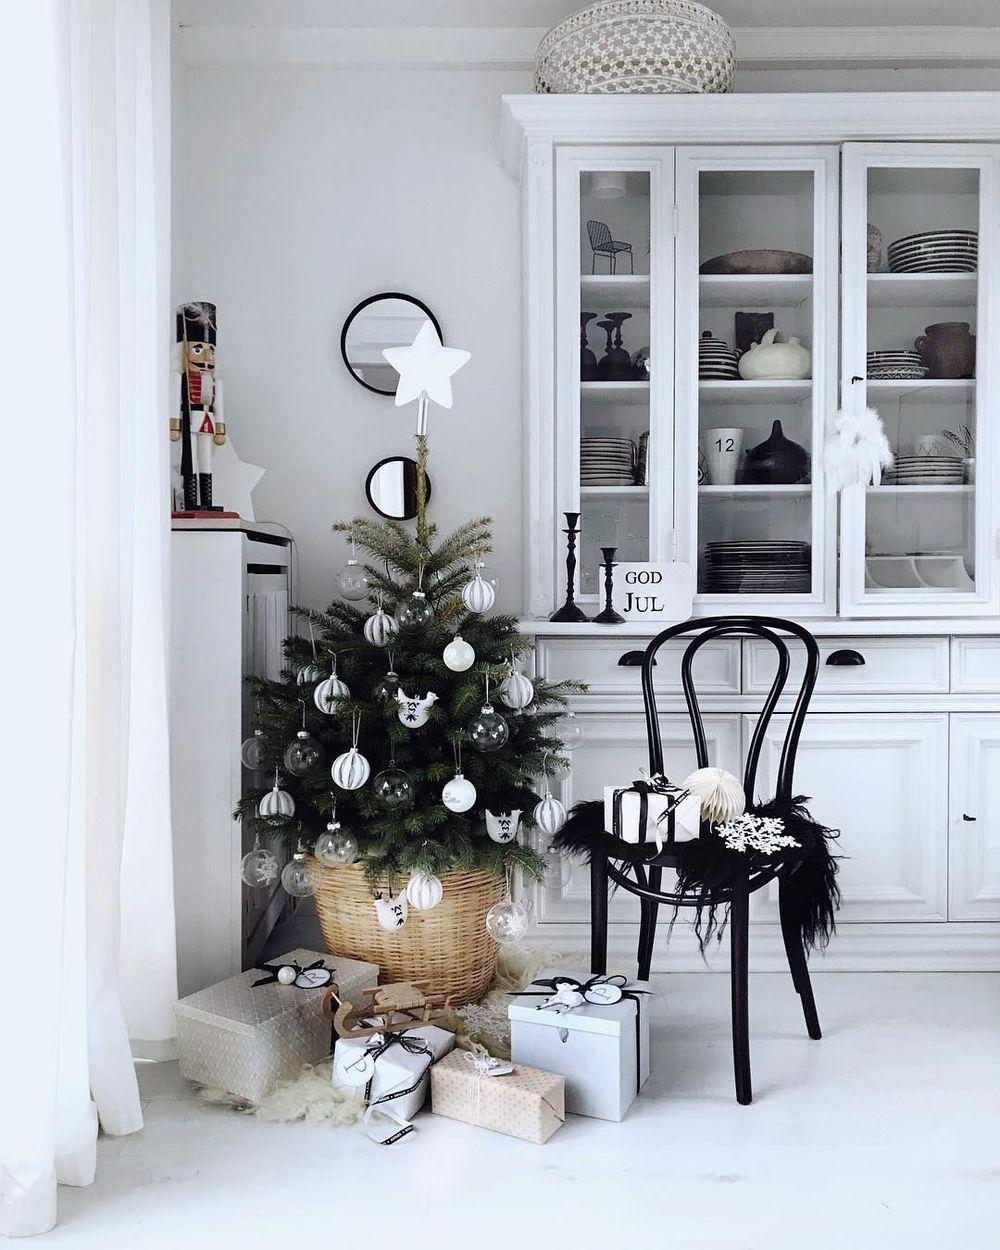 Kitchen Plate Cabinet Decor via houseofideas.de